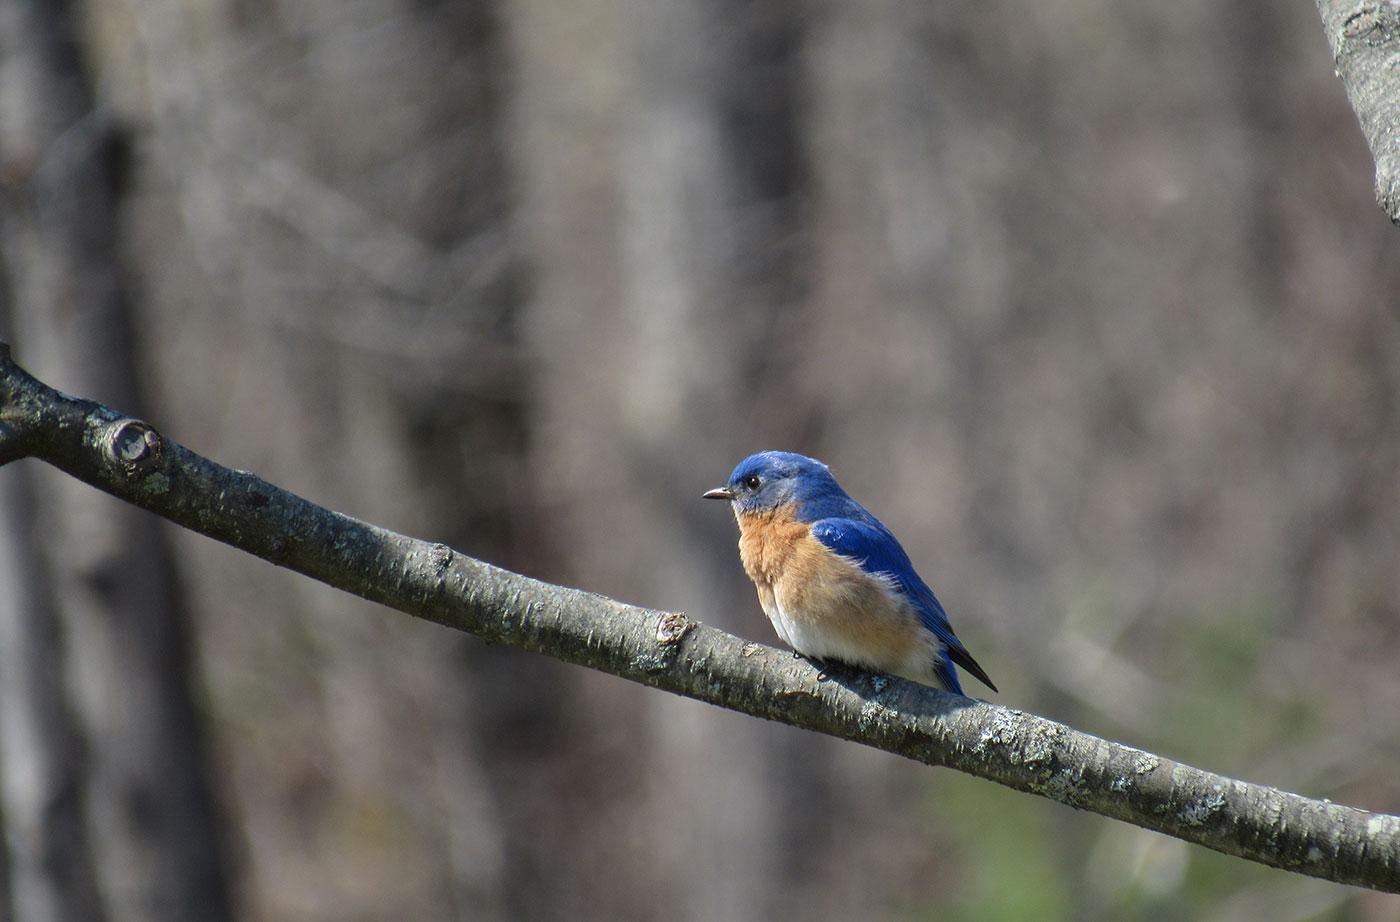 Eastern Bluebird by Kristen Lindquist